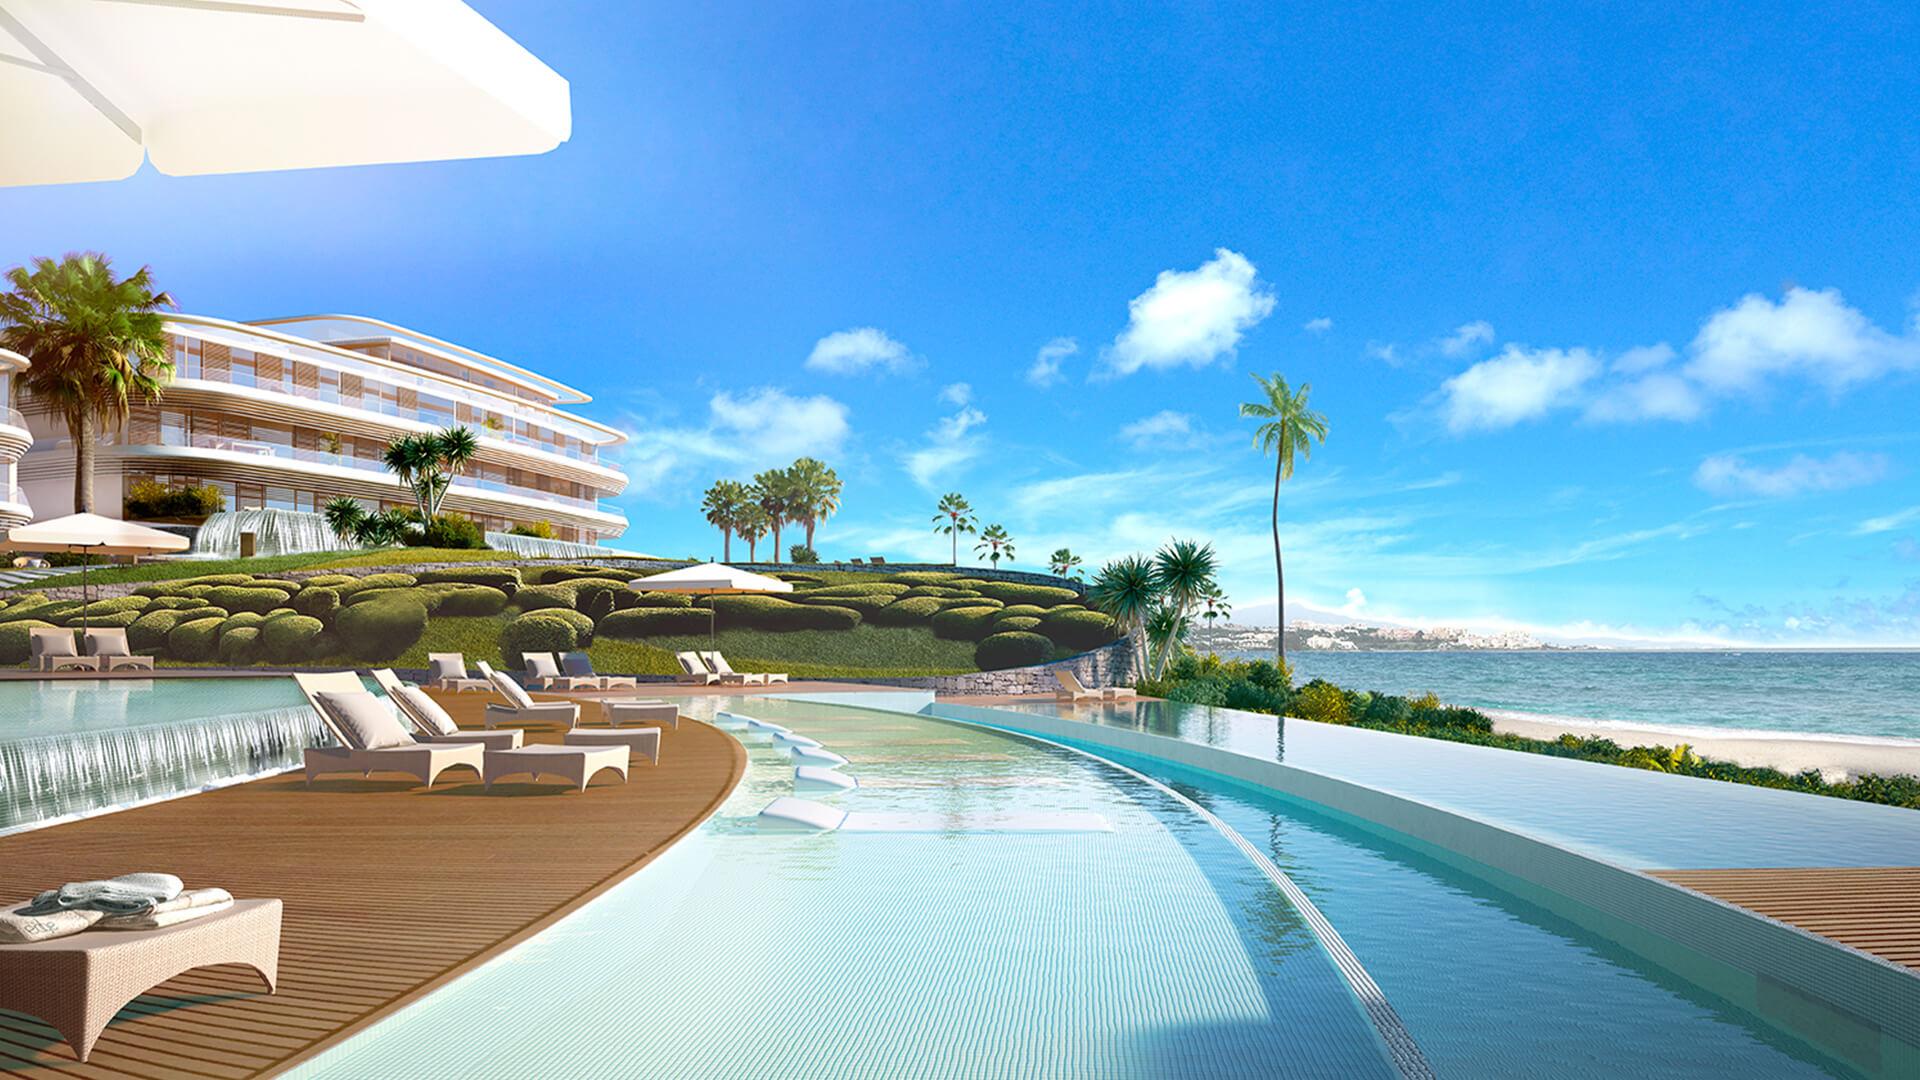 Ver detalles de Estepona Beach, en venta en Estepona